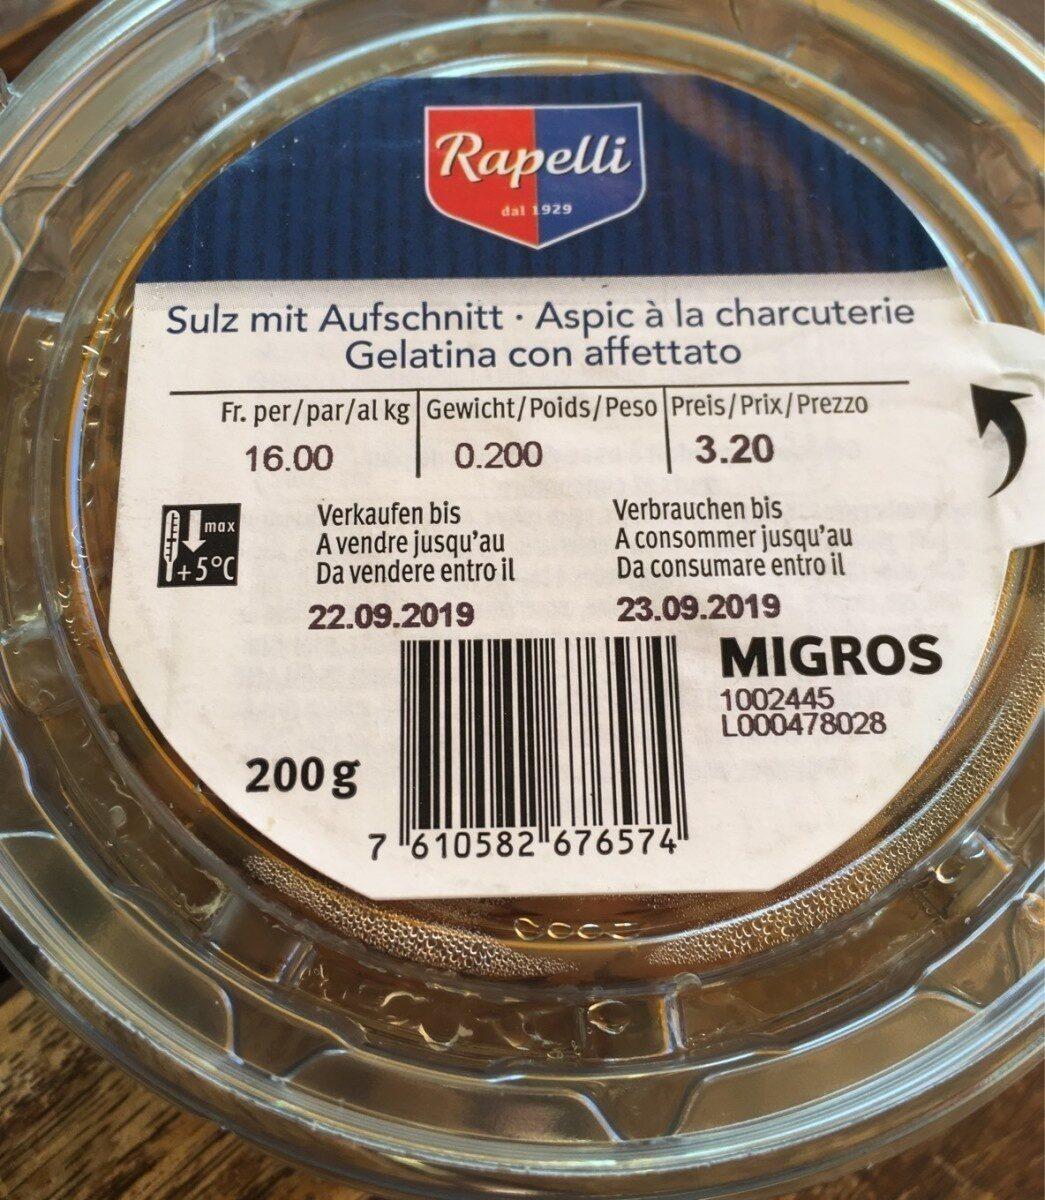 Aspic a la charcuterie - Product - fr